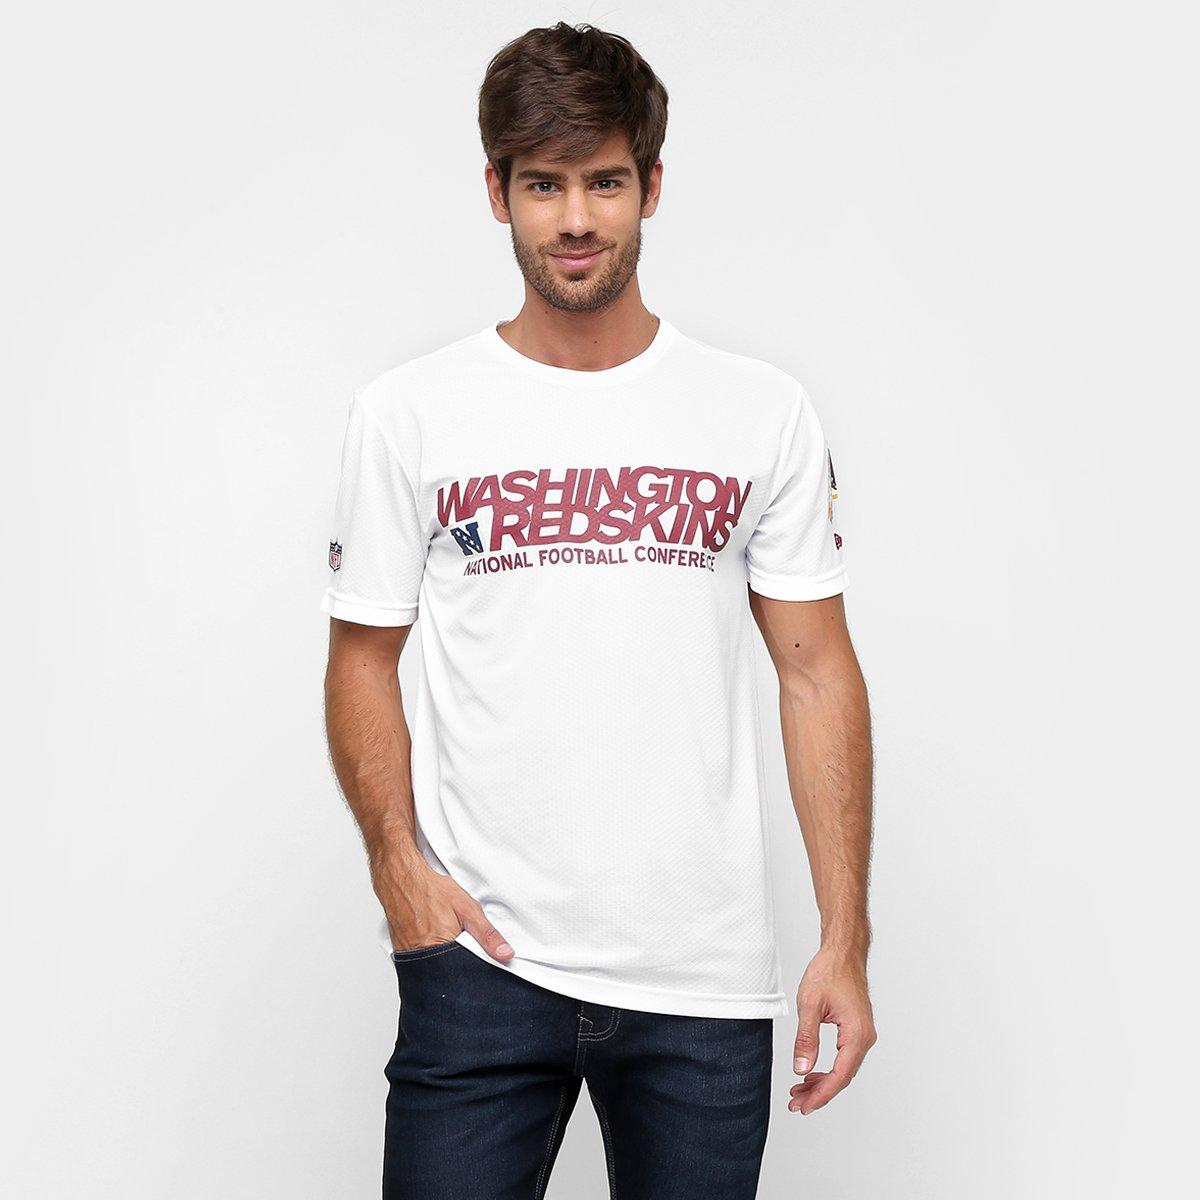 5db27bd41 Camiseta New Era NFL Race Washington Redskins - Compre Agora